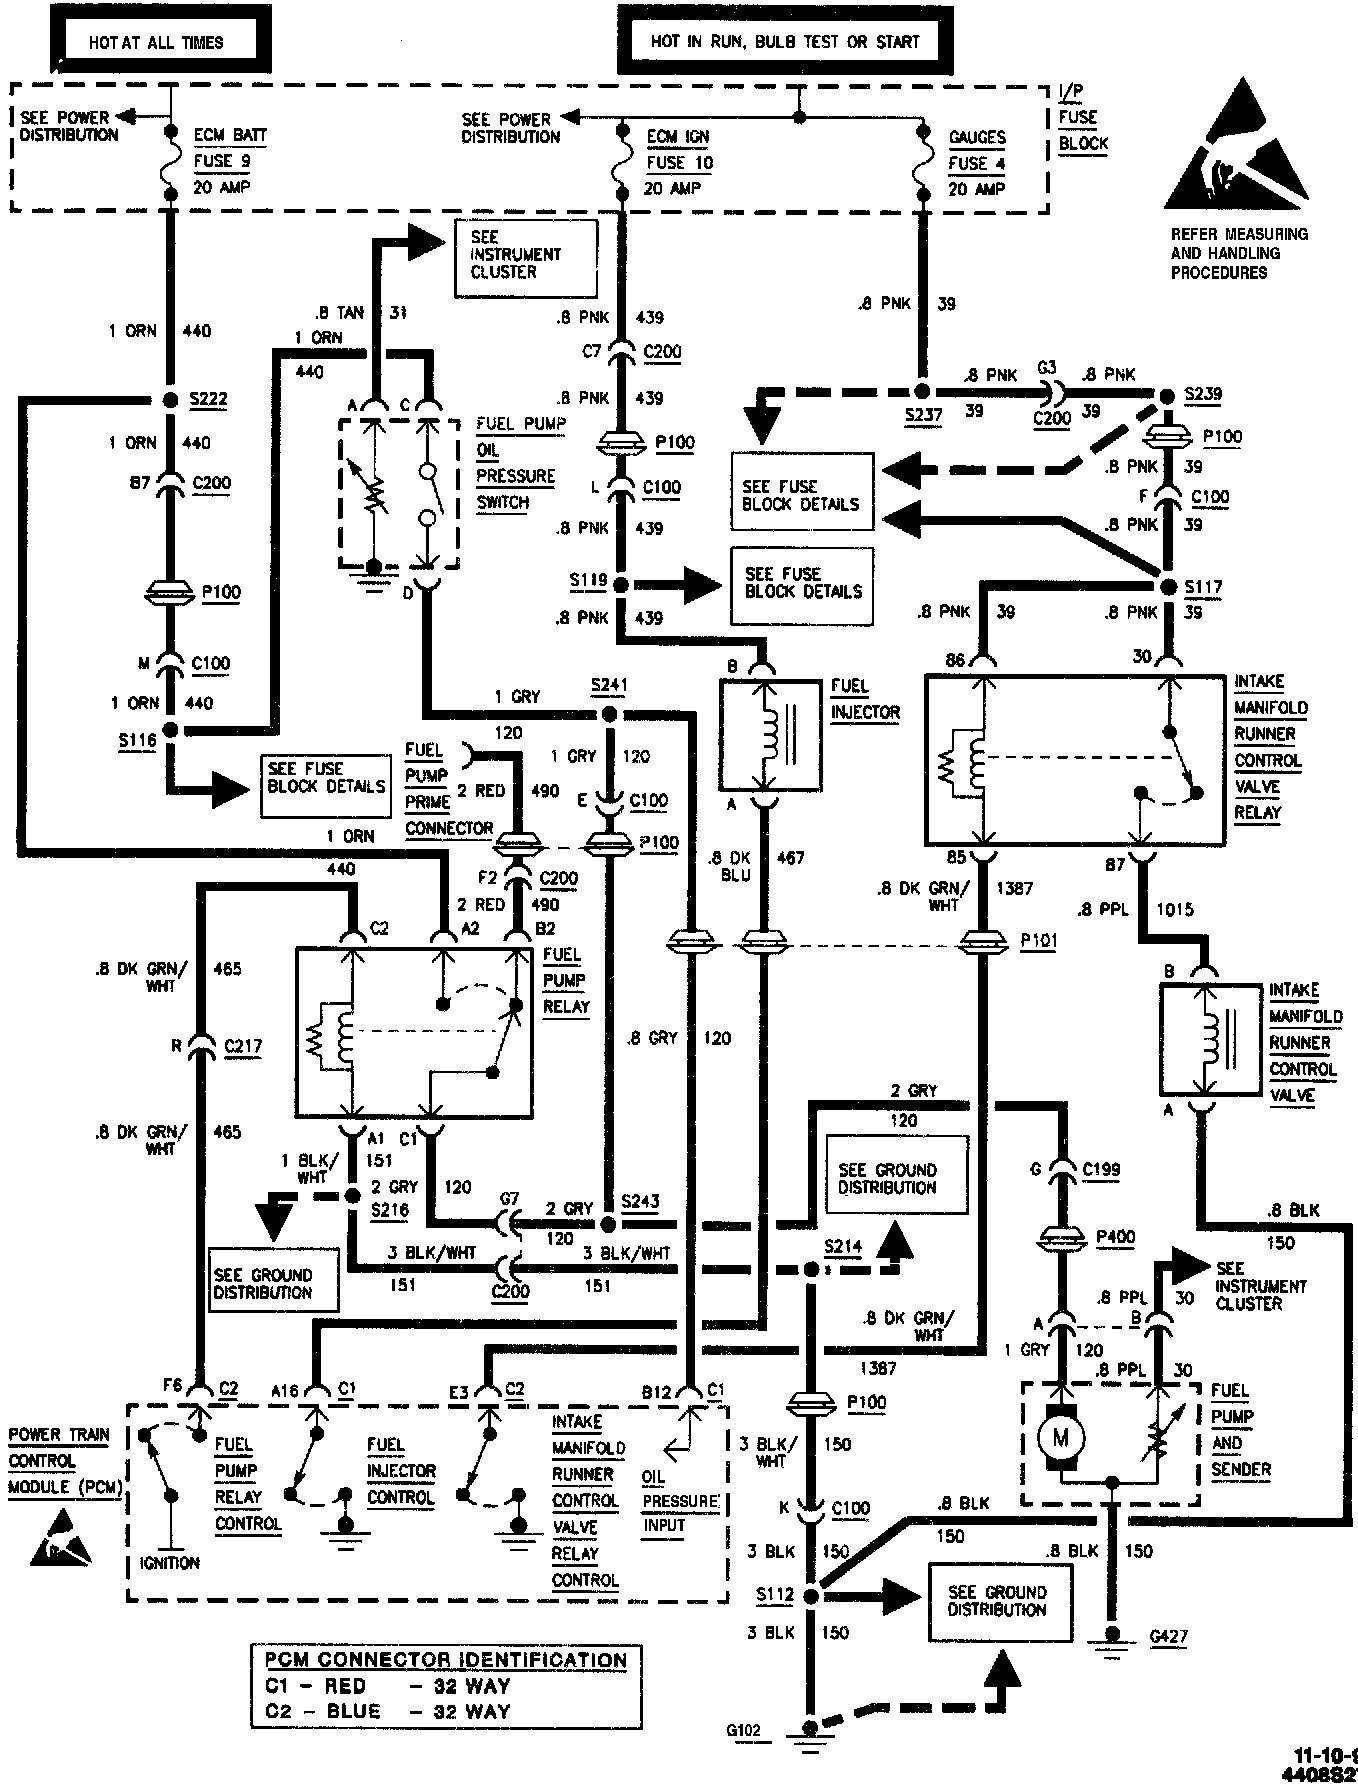 1994 chevy astro van radio wiring diagram auto electrical wiring1994 chevy astro van radio wiring diagram